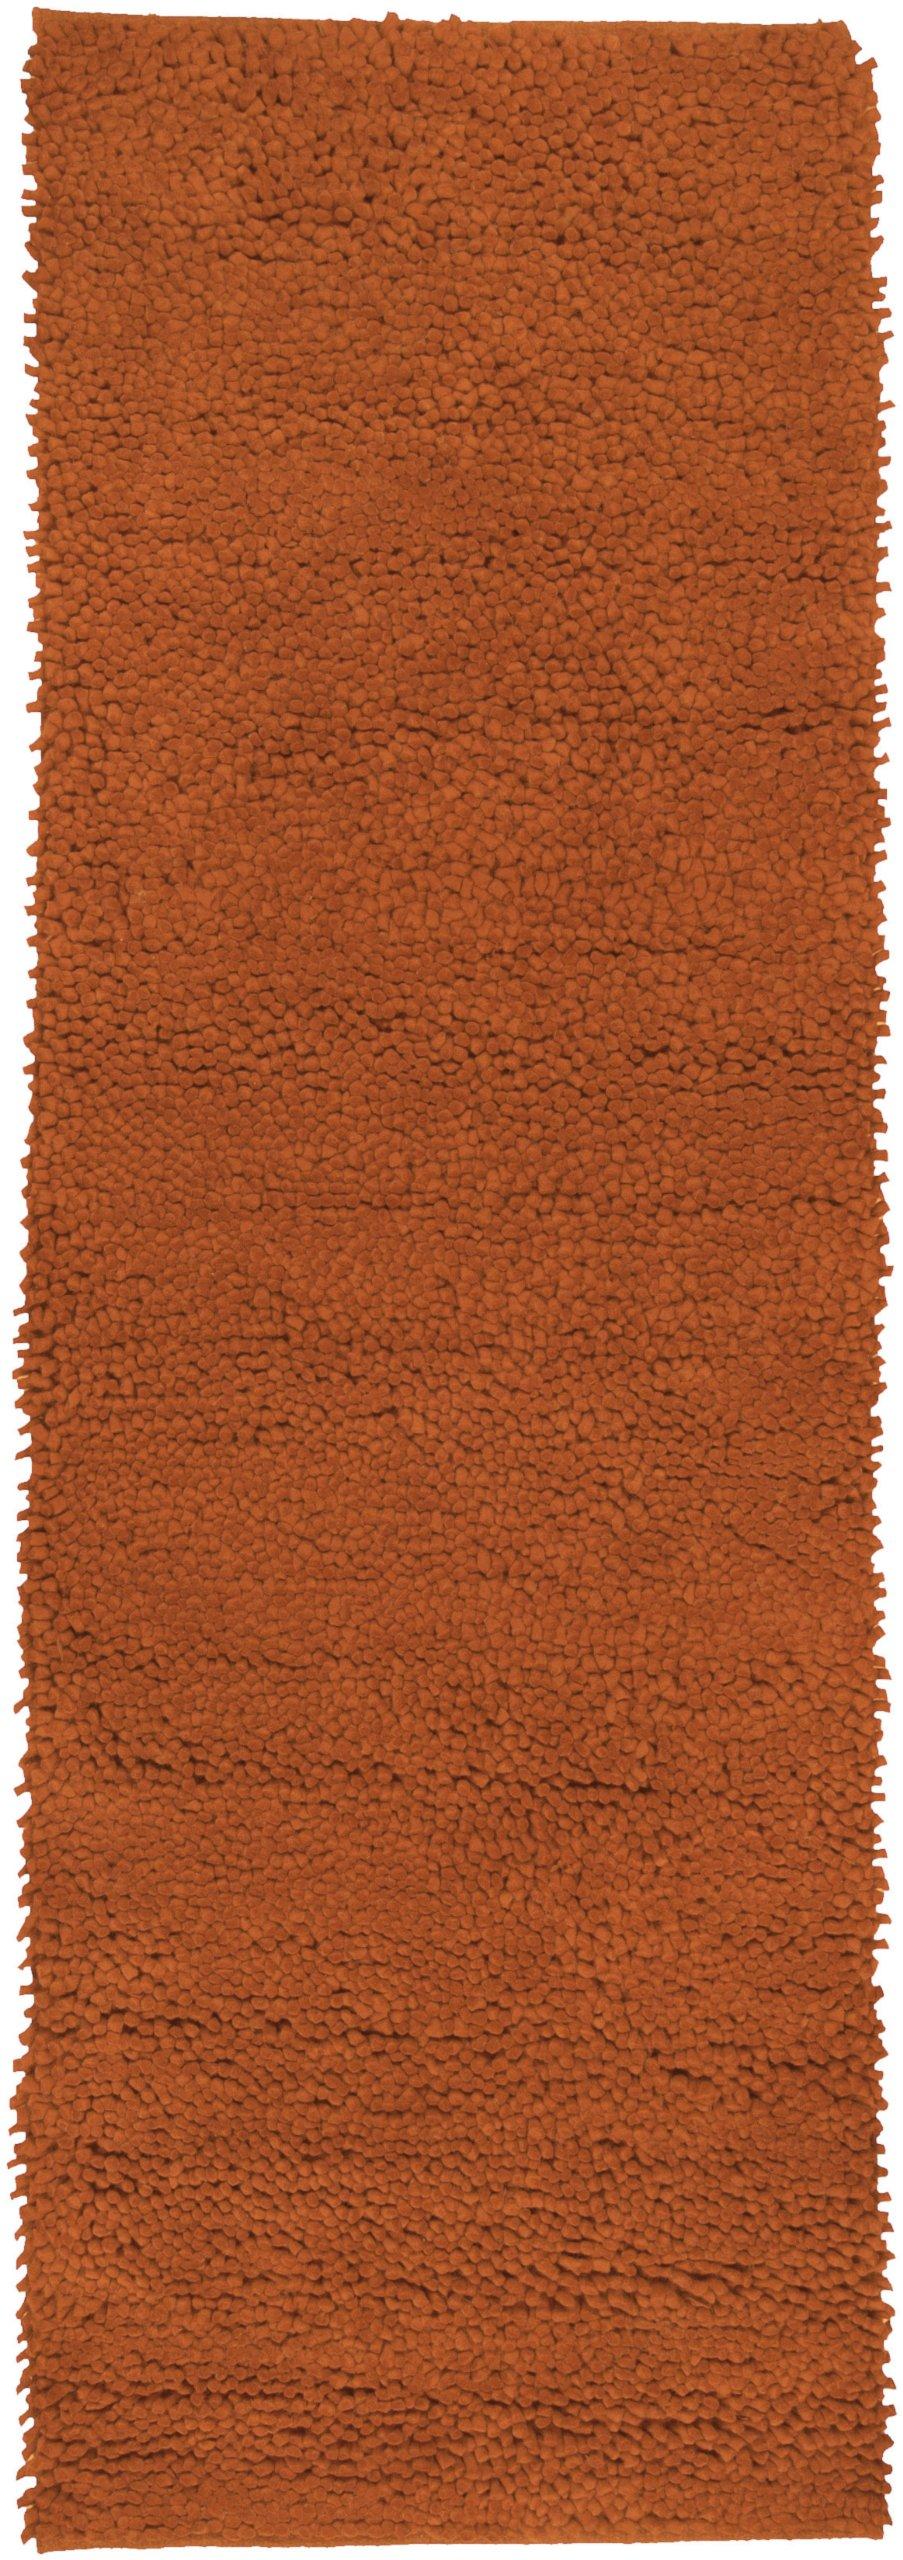 Surya Aros AROS-5 Shag Hand Woven 100% New Zealand Felted Wool Rust Red 2'6'' x 8' Runner